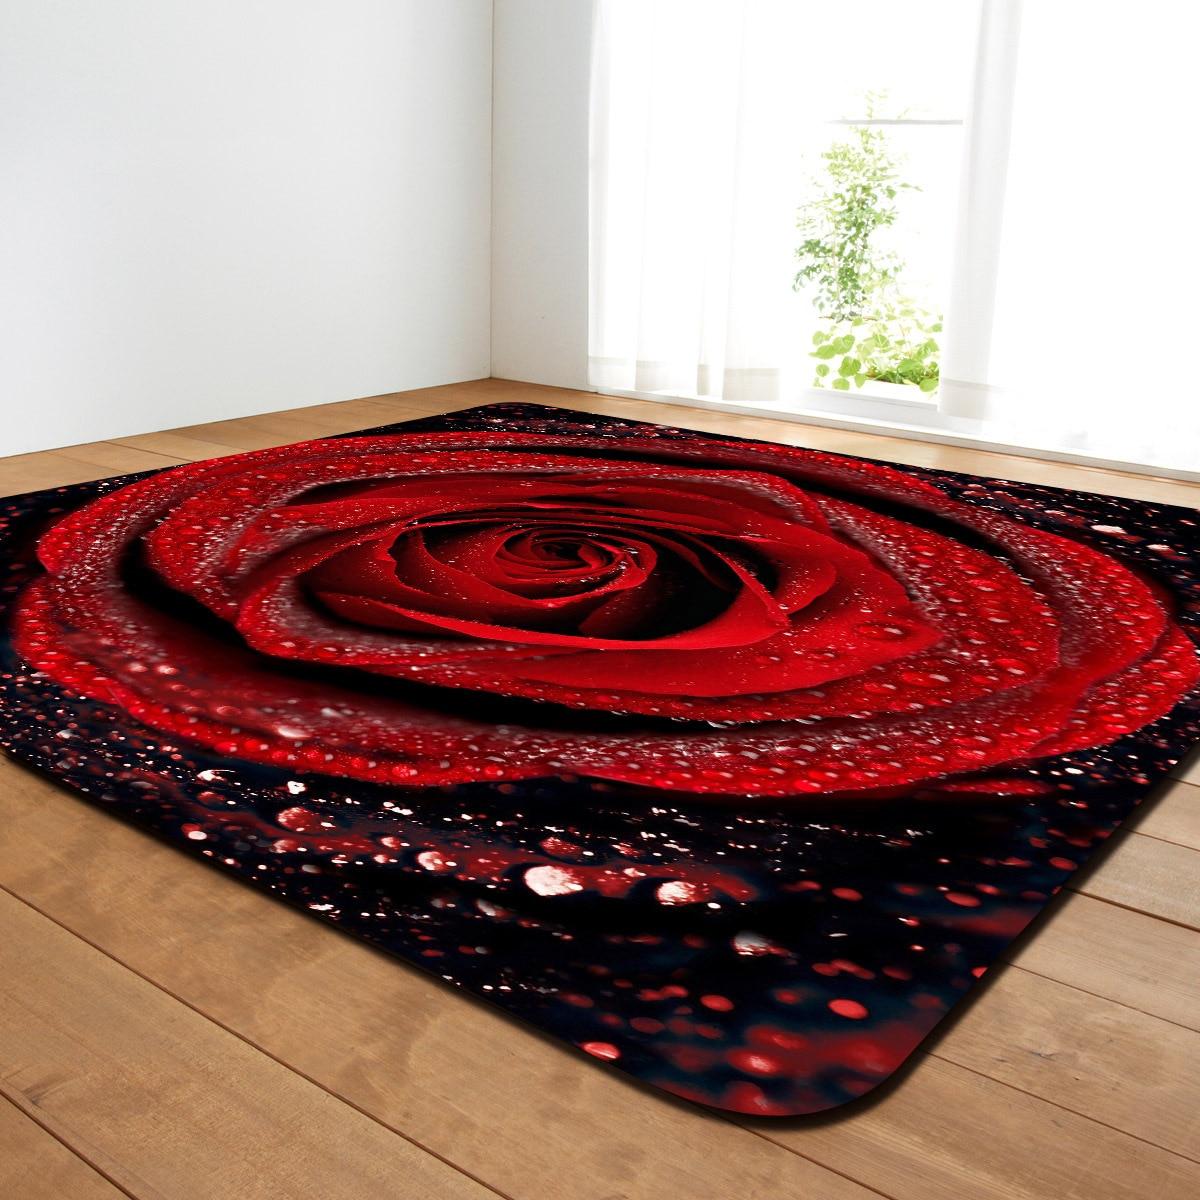 WUJIE 3D Flowers Pattern Carpets Non-Slip Large Area Rug For Living Room Rectangle Floor Mat For Bedroom/Parlor/Hallway/Kicken